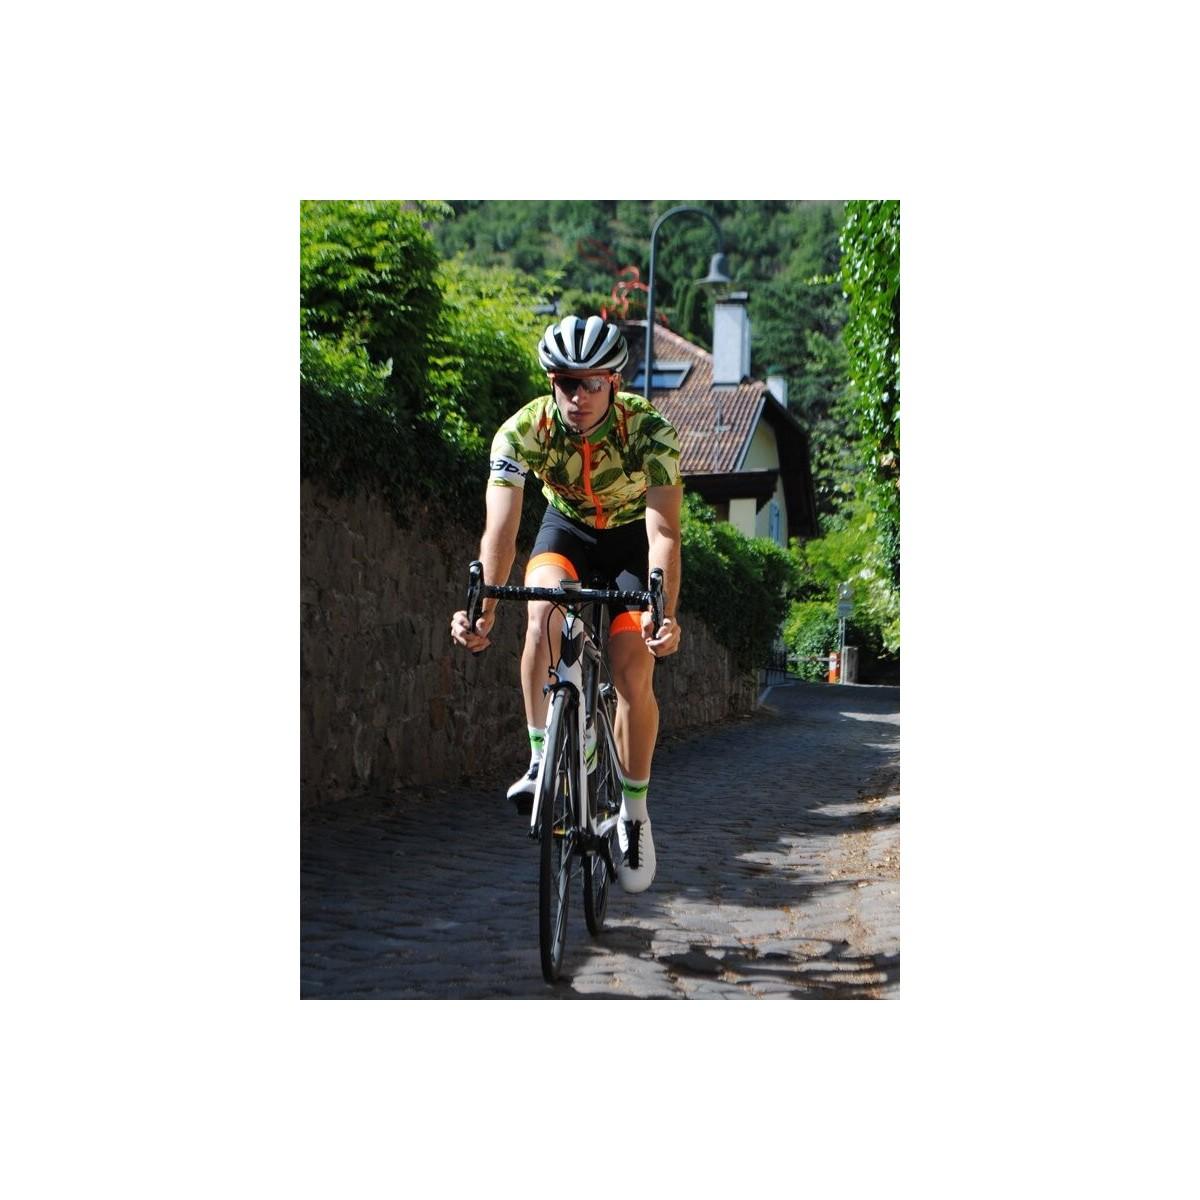 Fahrradbekleidung Q36.5 Jersey Short Sleeve R1 Flower Power Trikots